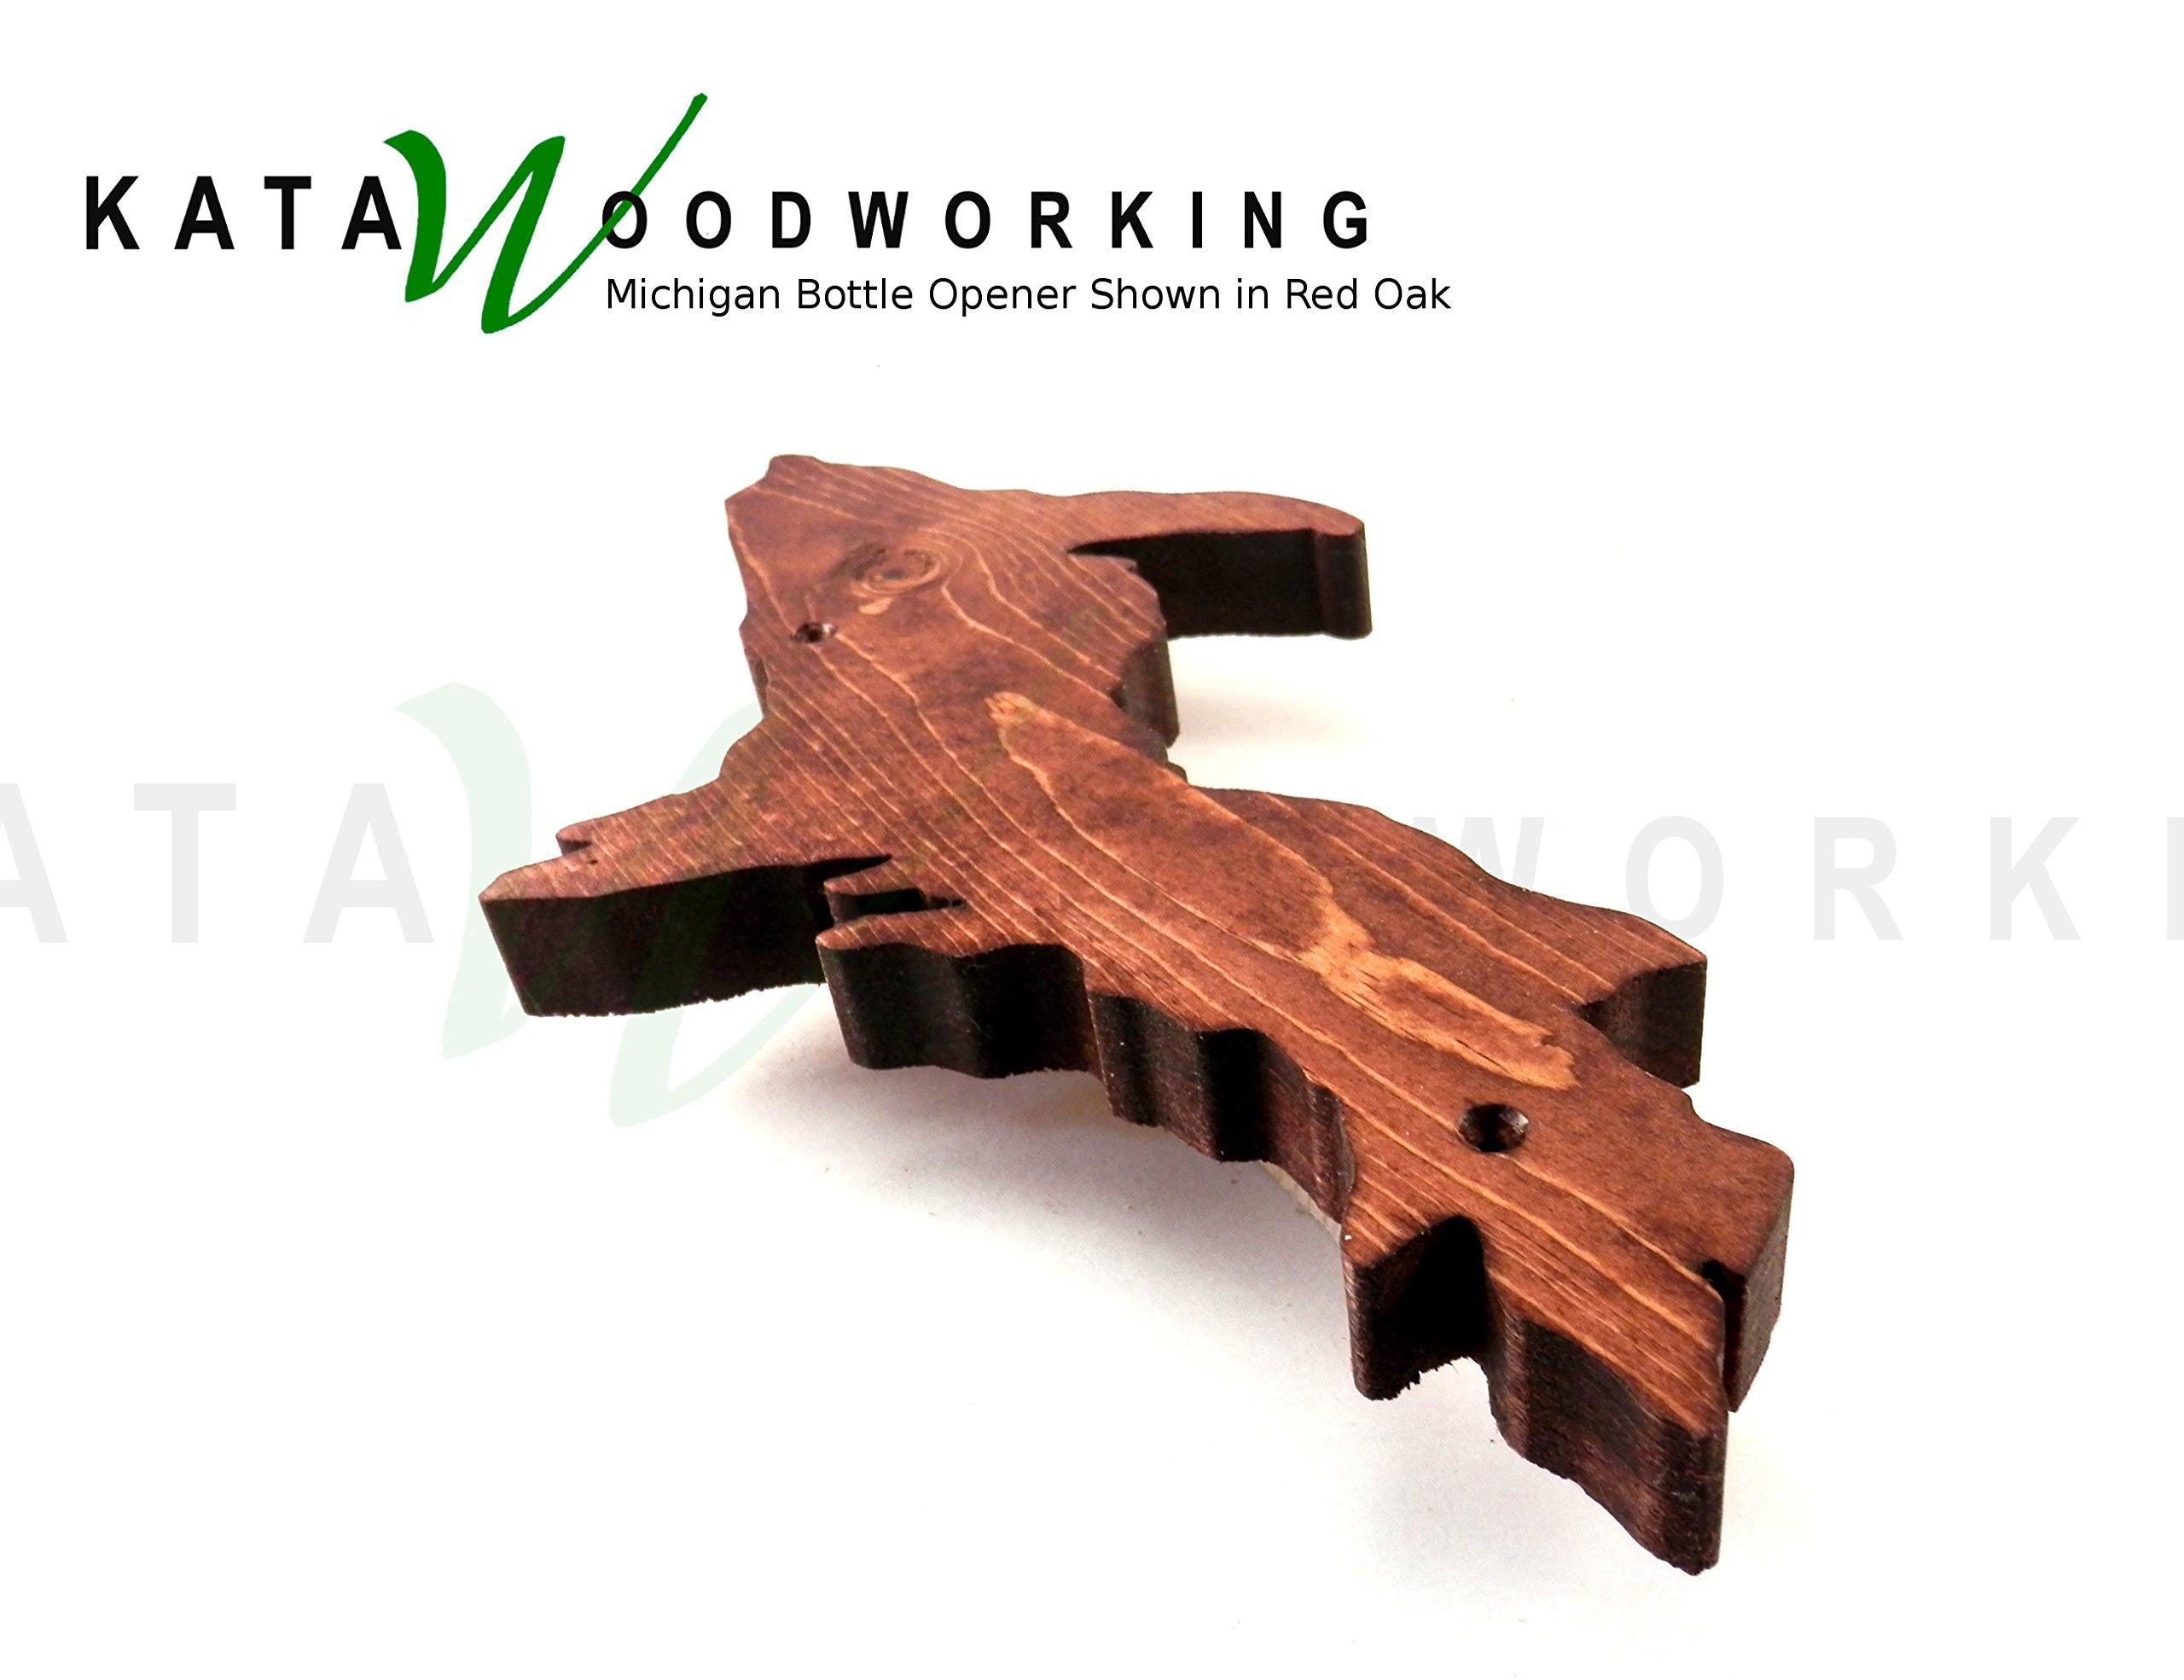 Michigan Upper & Lower Peninsula Shaped Wood Cut-out Bottle Opener - Wall Mount - Handmade by Kata Woodworking (Image #3)